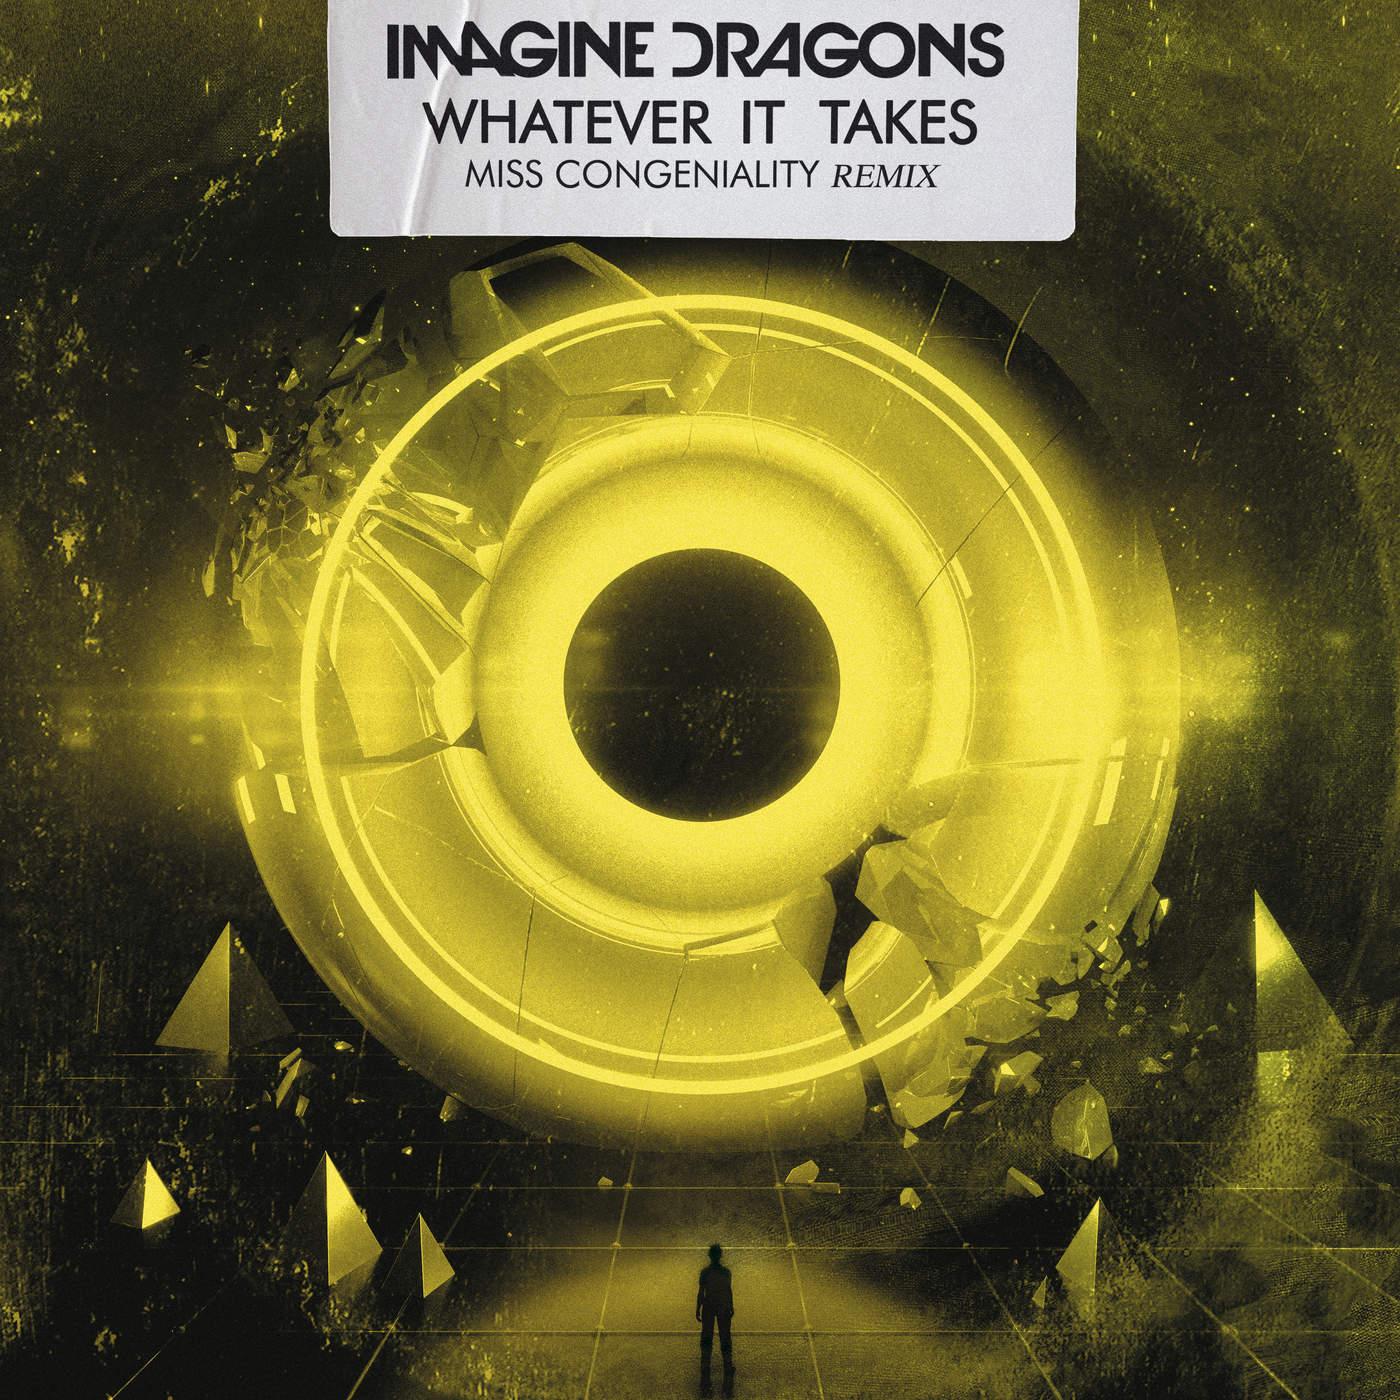 Imagine Dragons & Miss Congeniality - Whatever It Takes (Miss Congeniality Remix) - Single